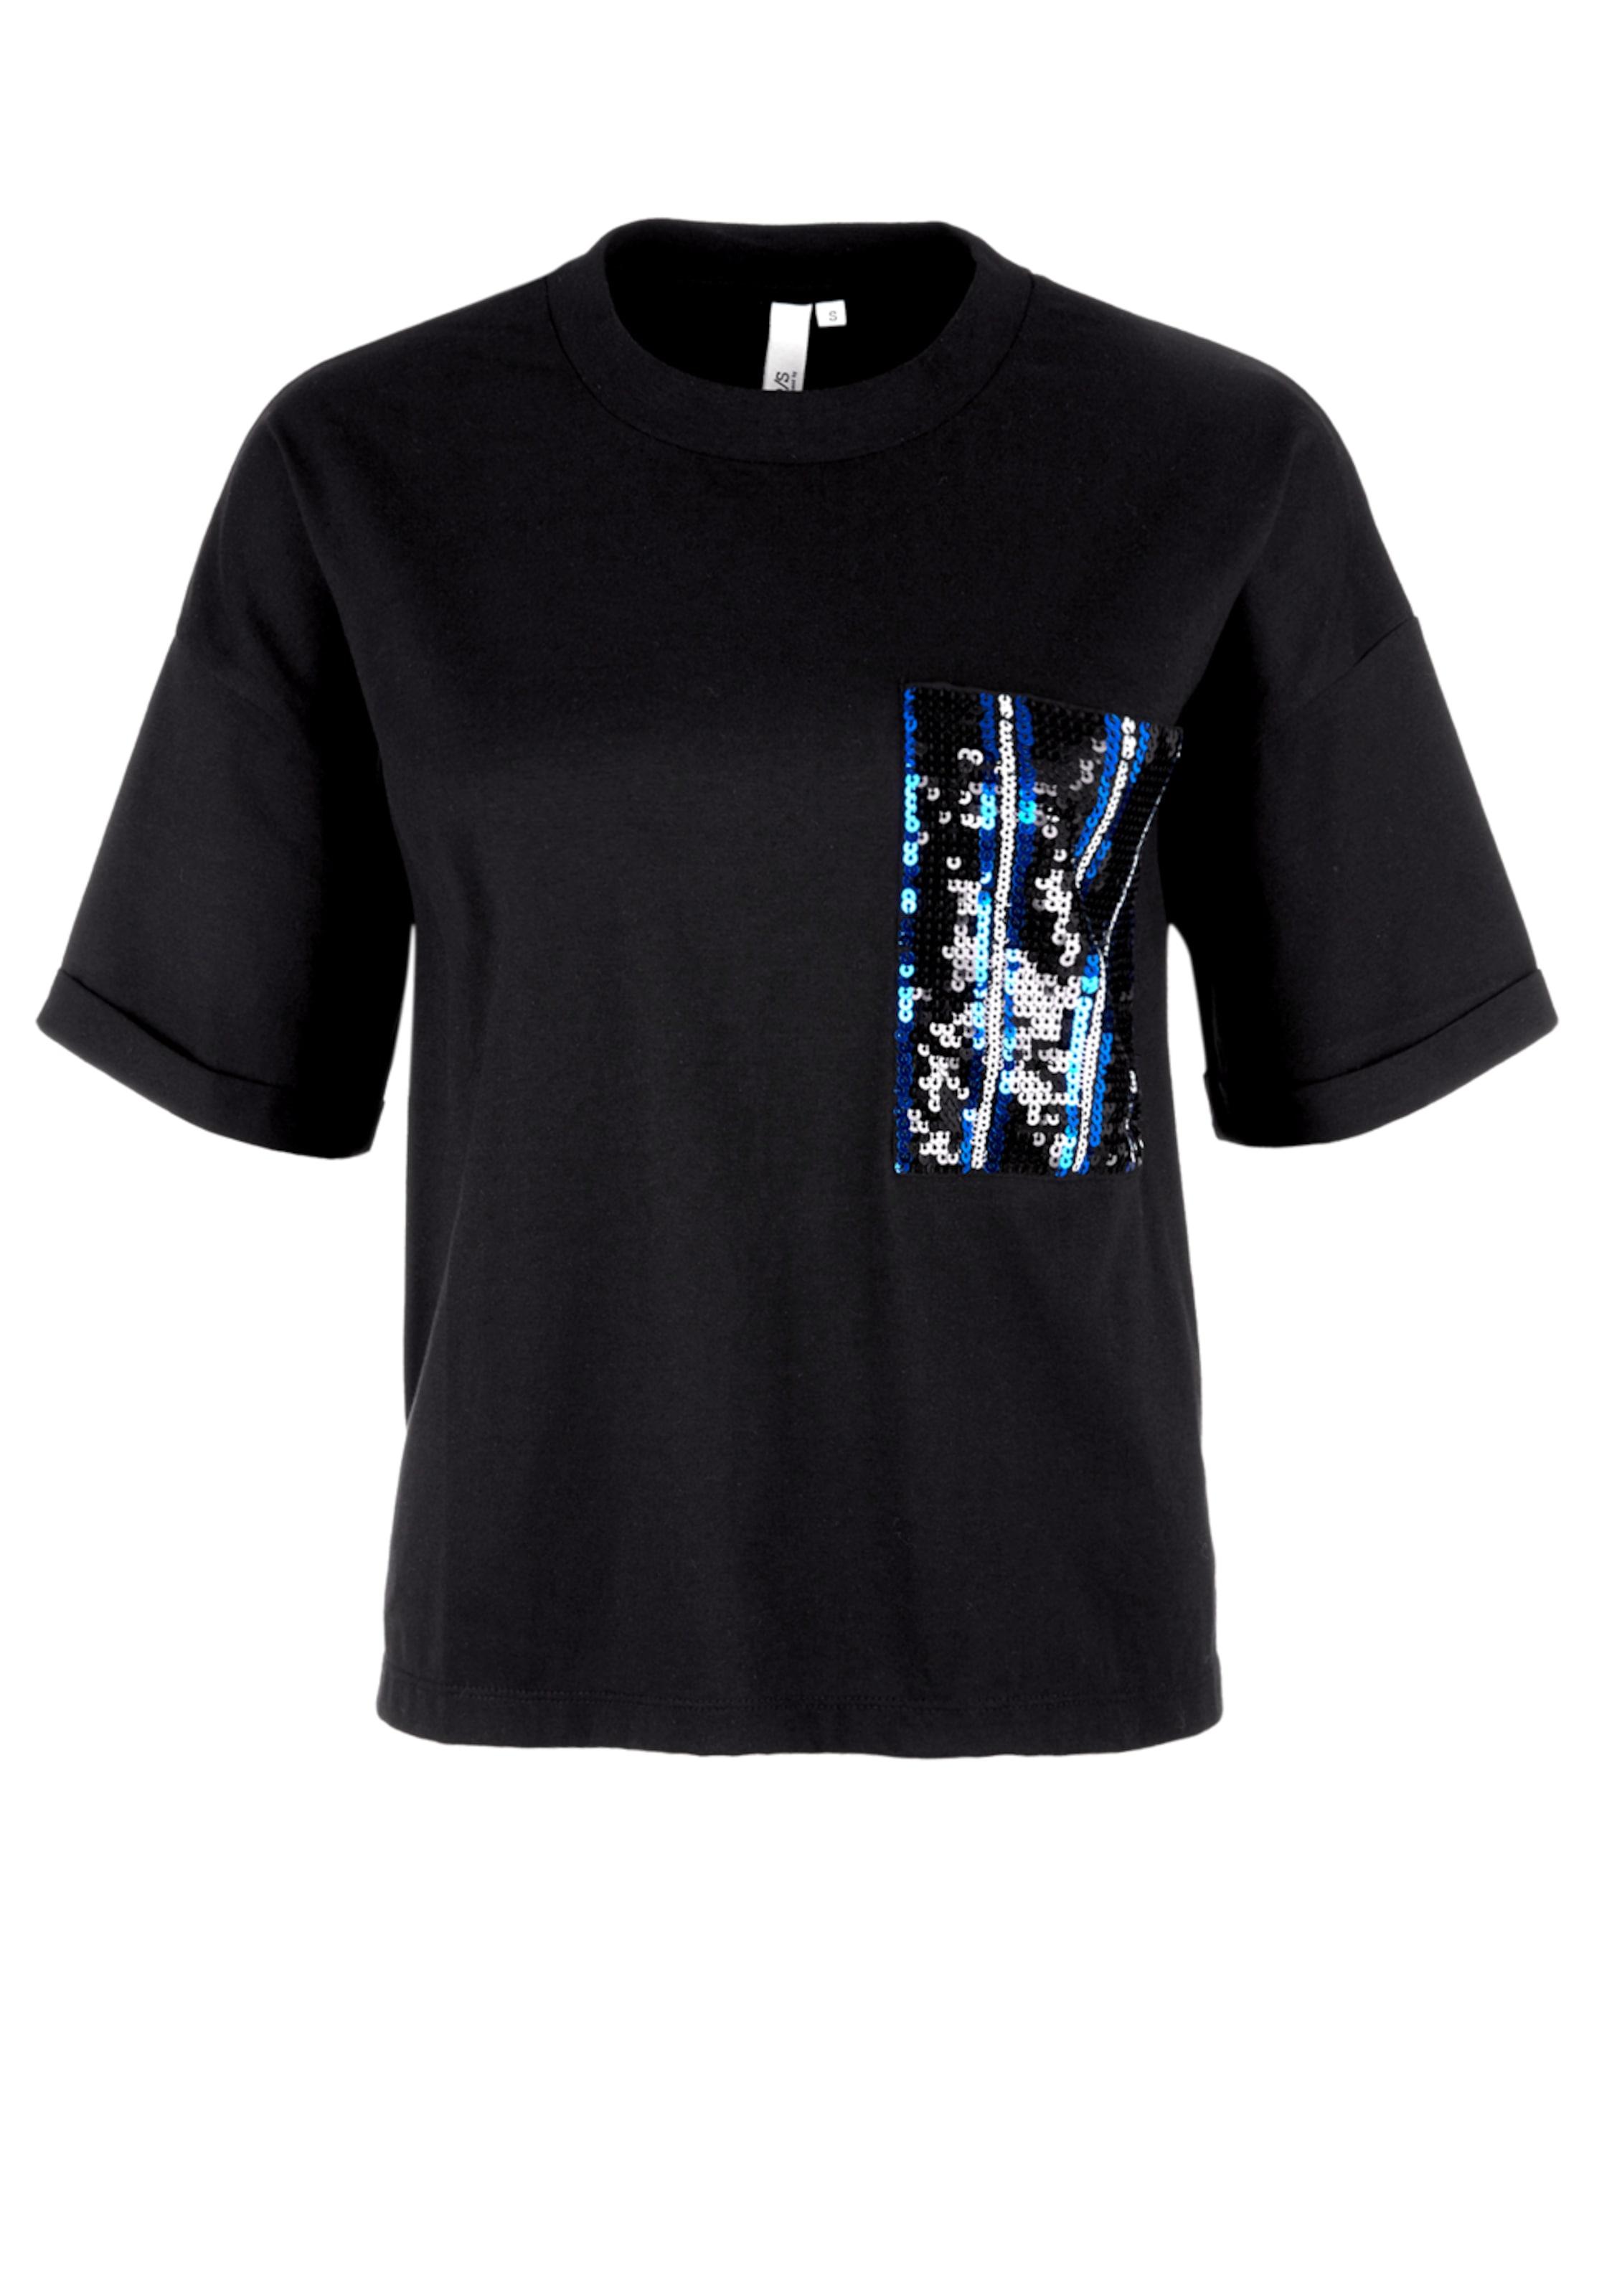 Q Weiß Schwarz s Designed In BlauHellblau By Shirt XPkNO8nw0